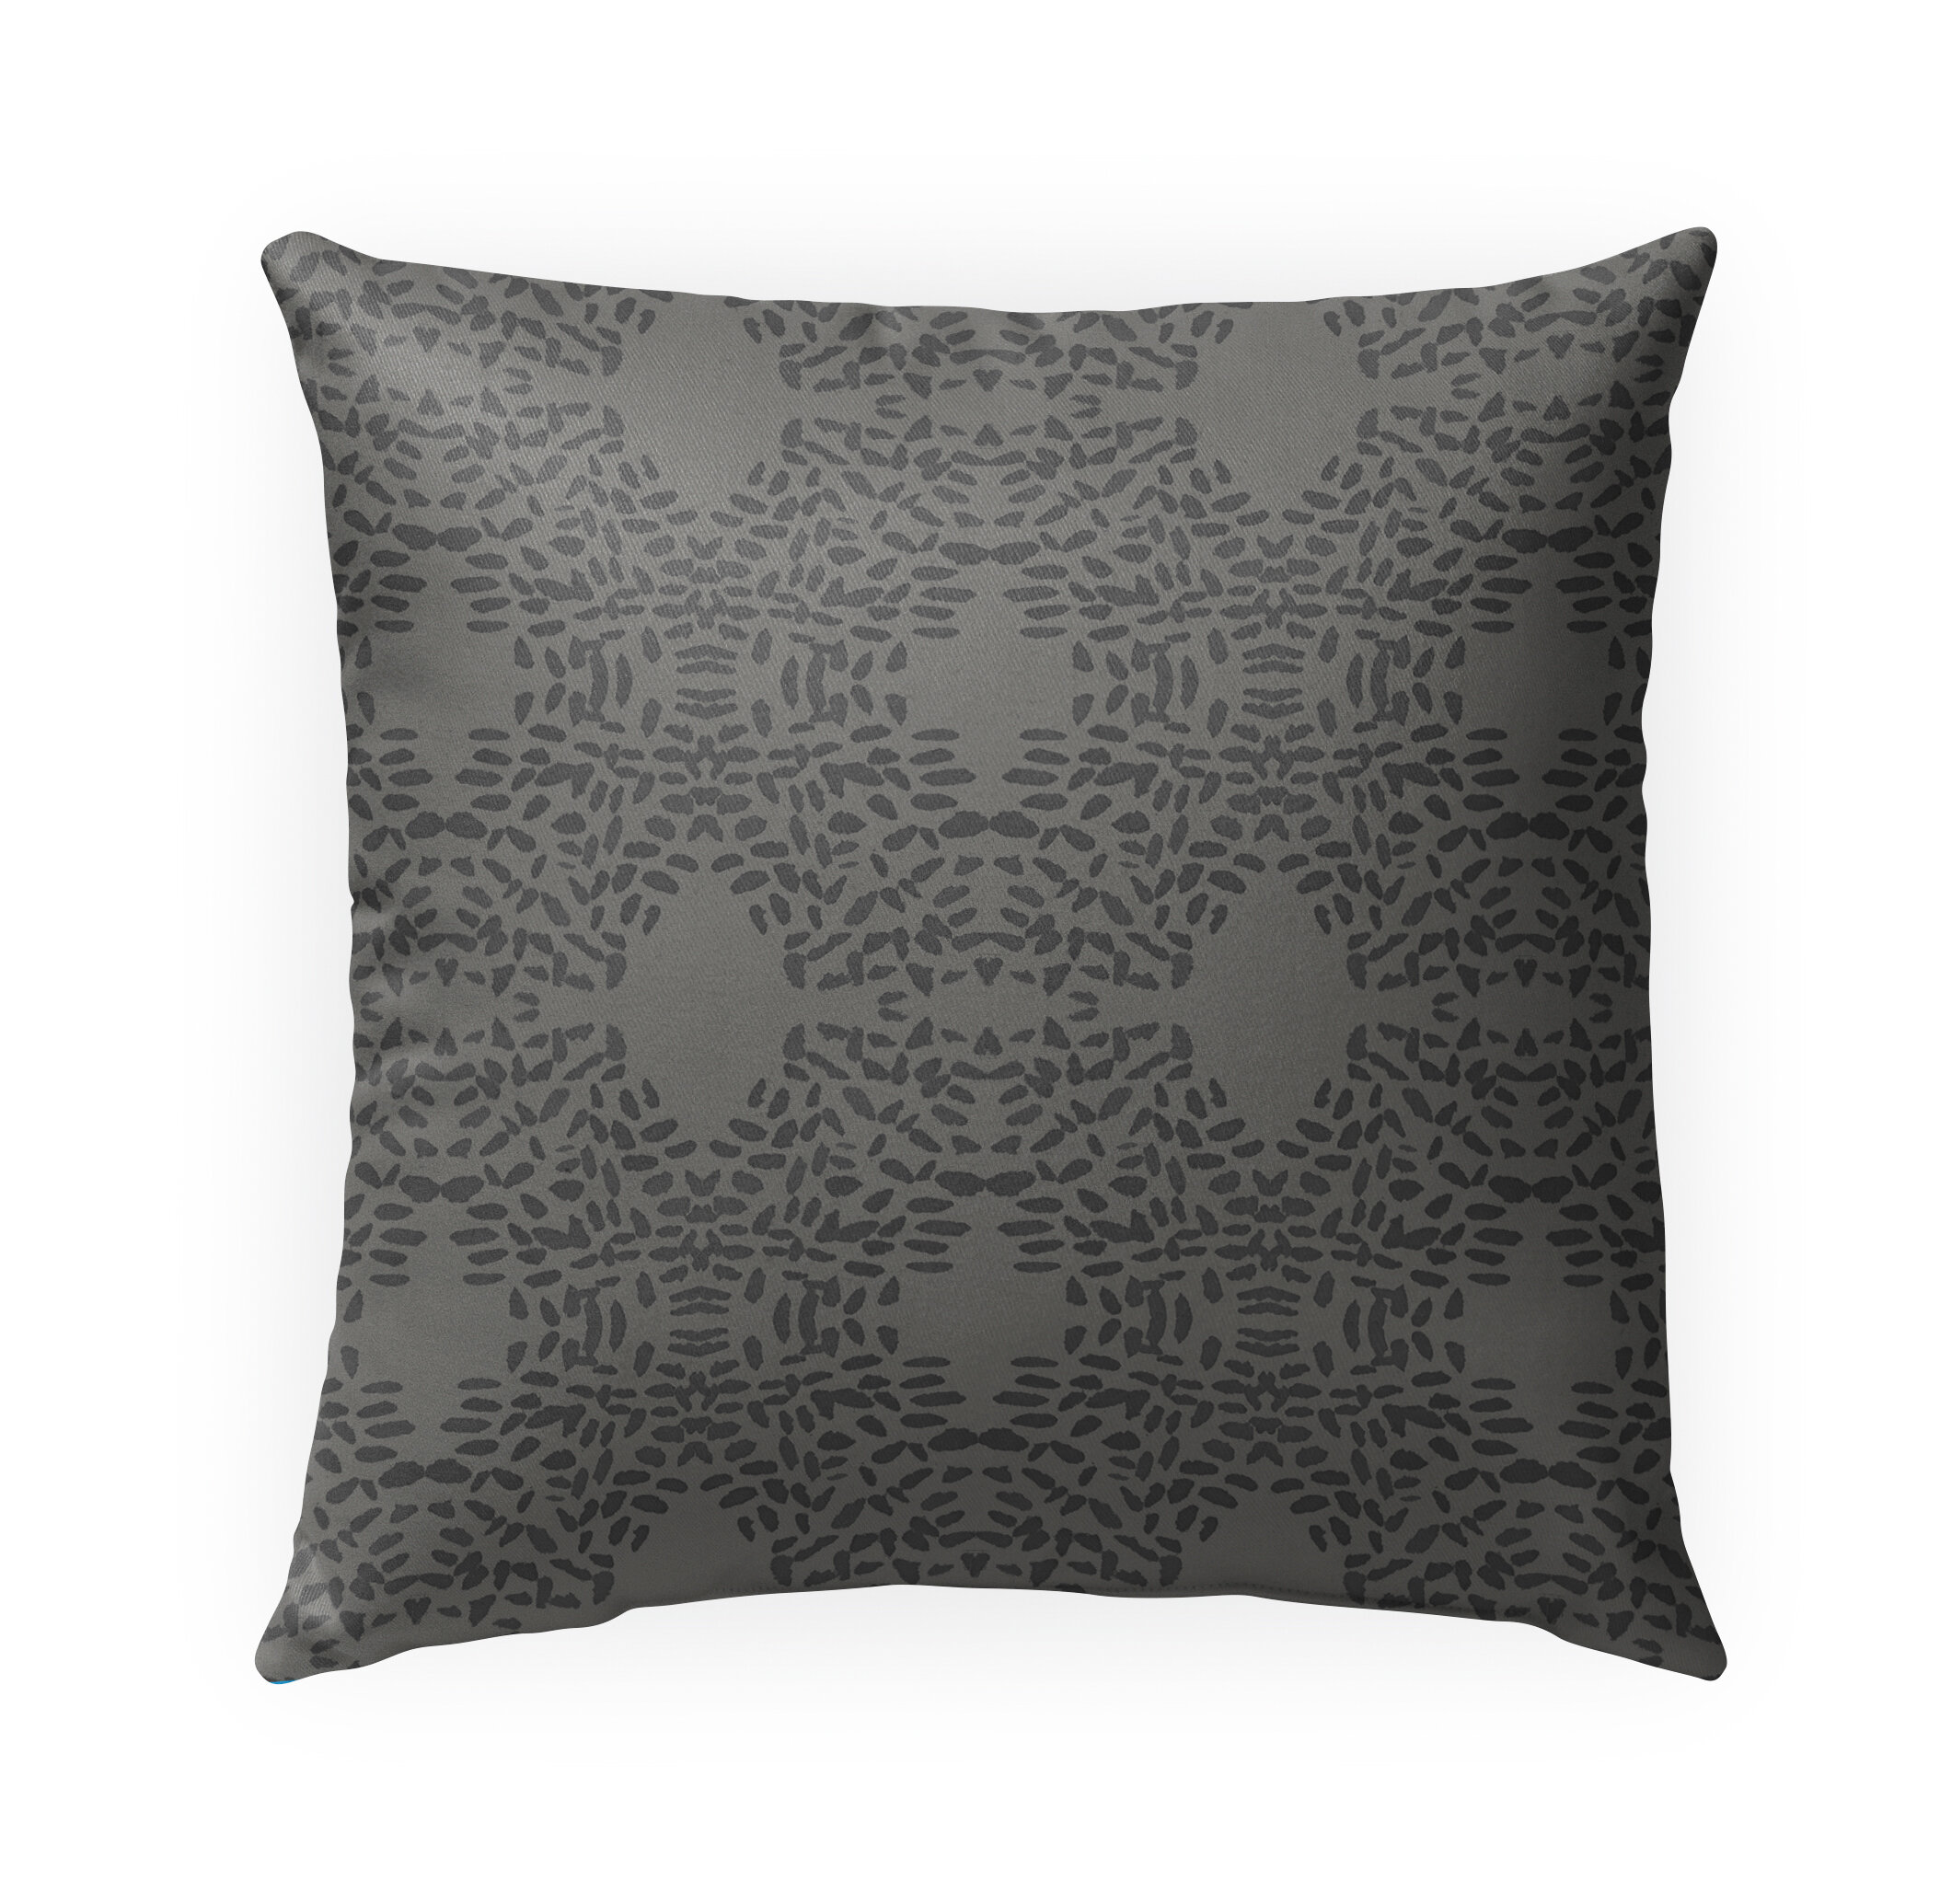 Decorative Stone Bowl Throw Pillows You Ll Love In 2021 Wayfair